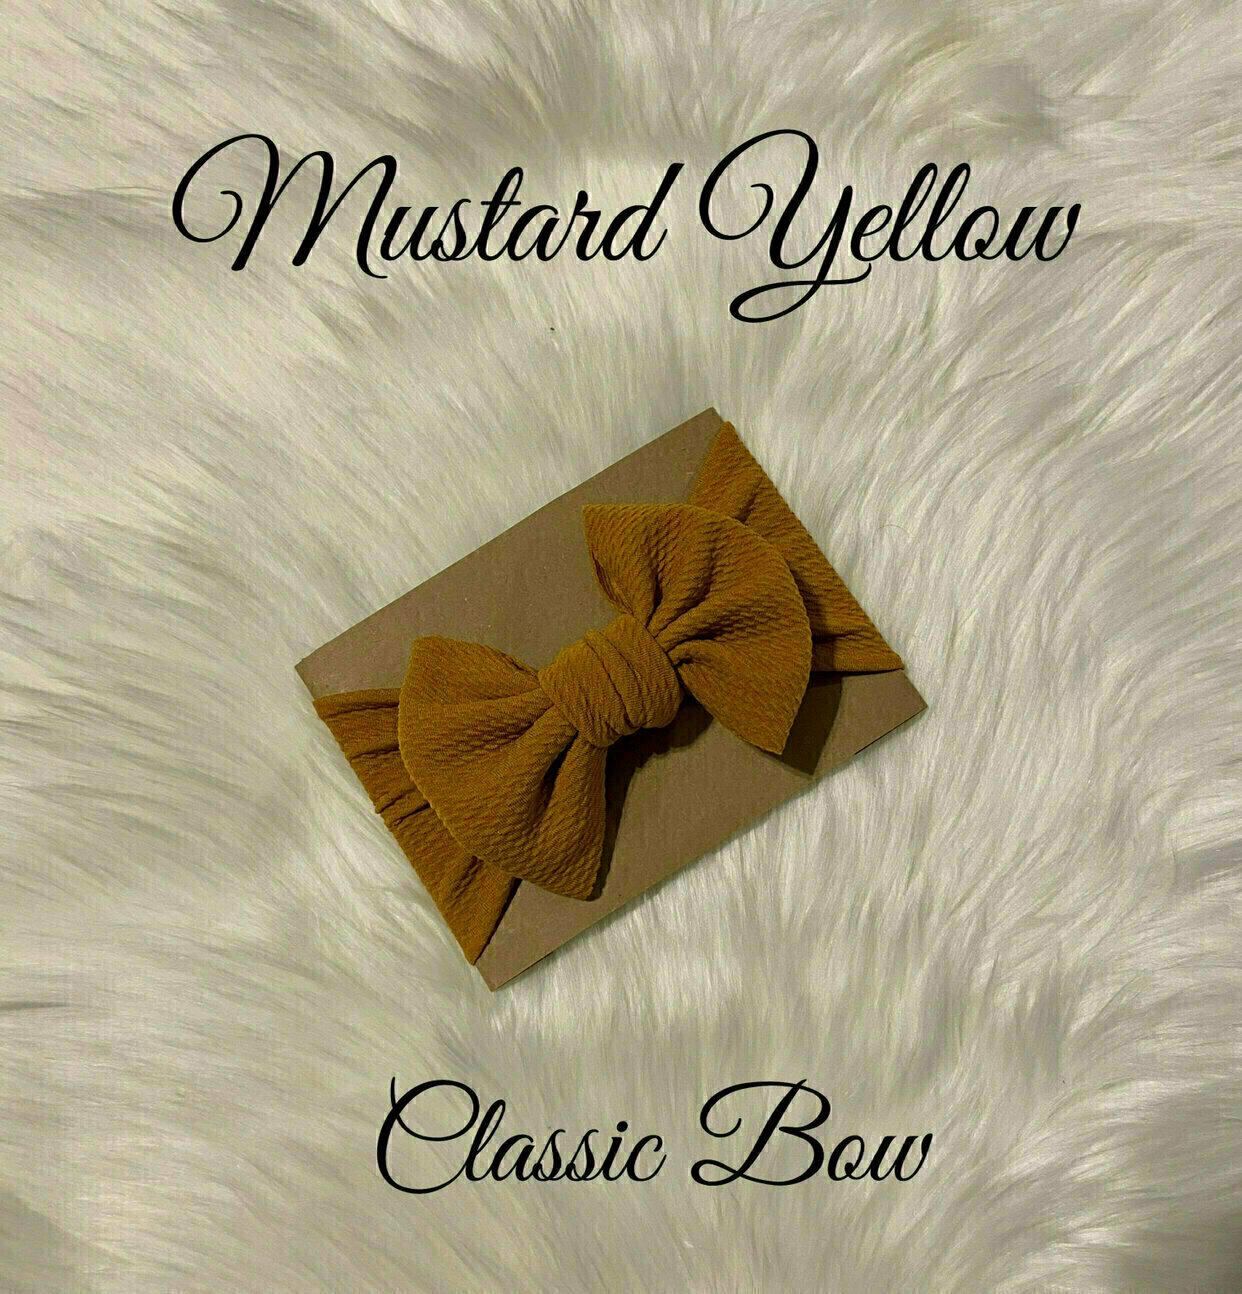 Mustard Messy Bow